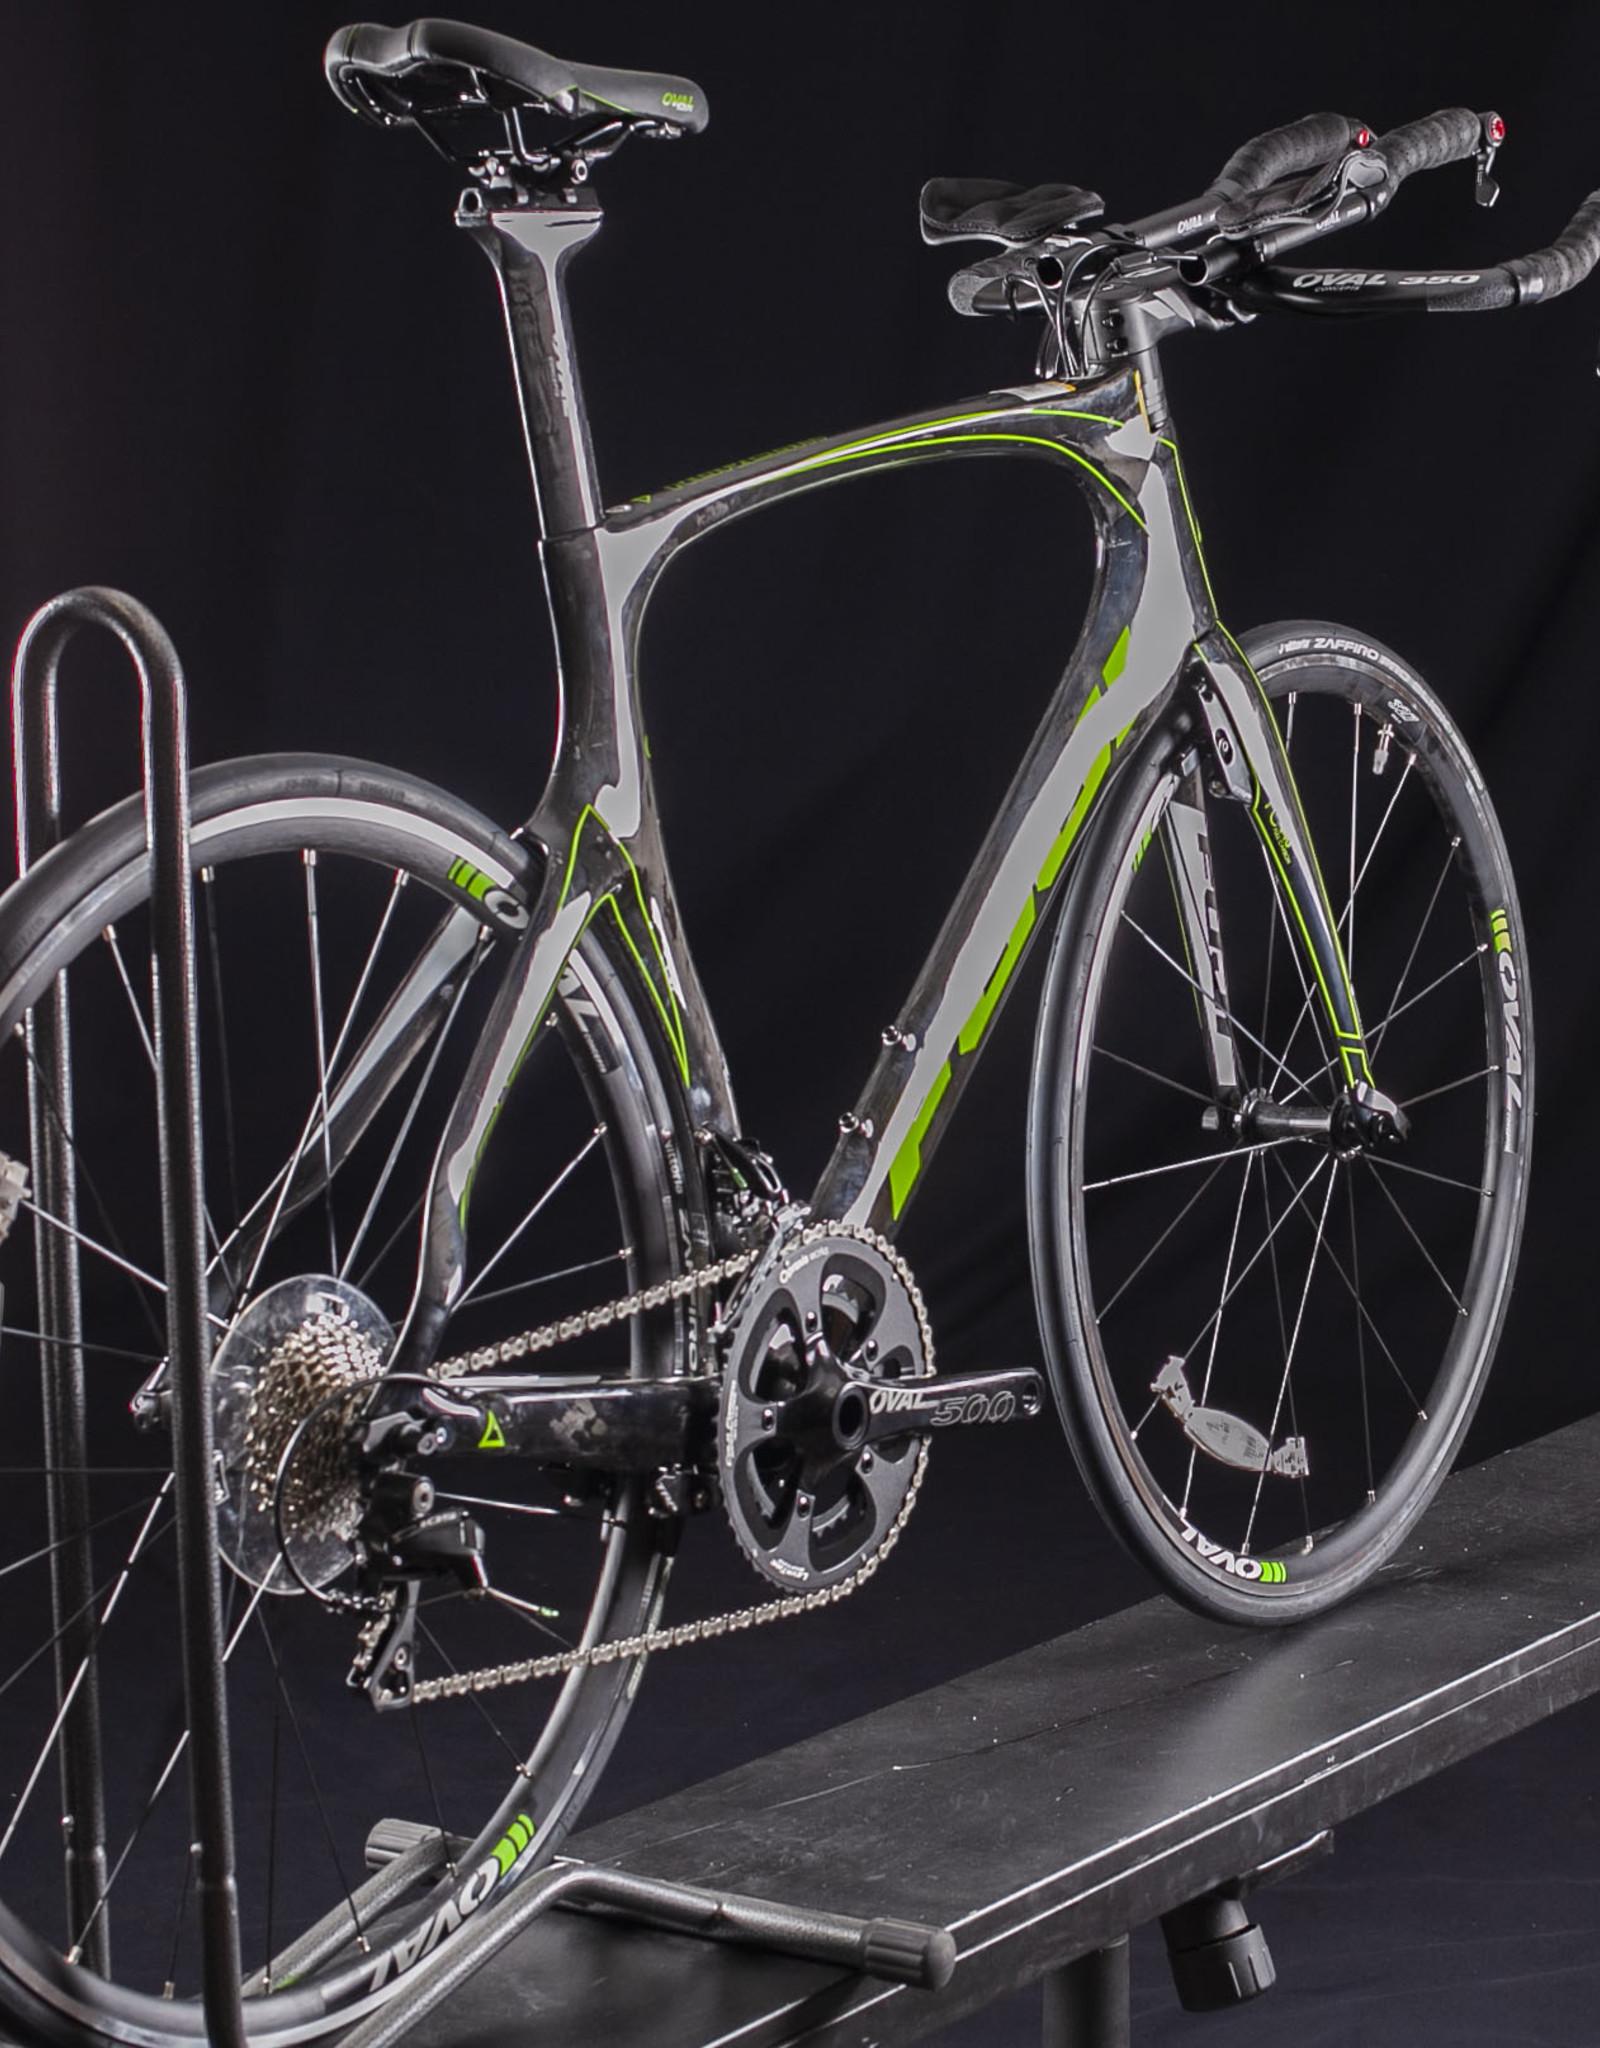 NOS 2017 Fuji Norcom straight 2.3 Carbon Tri/TT Bike,shimano 105, size 55cm